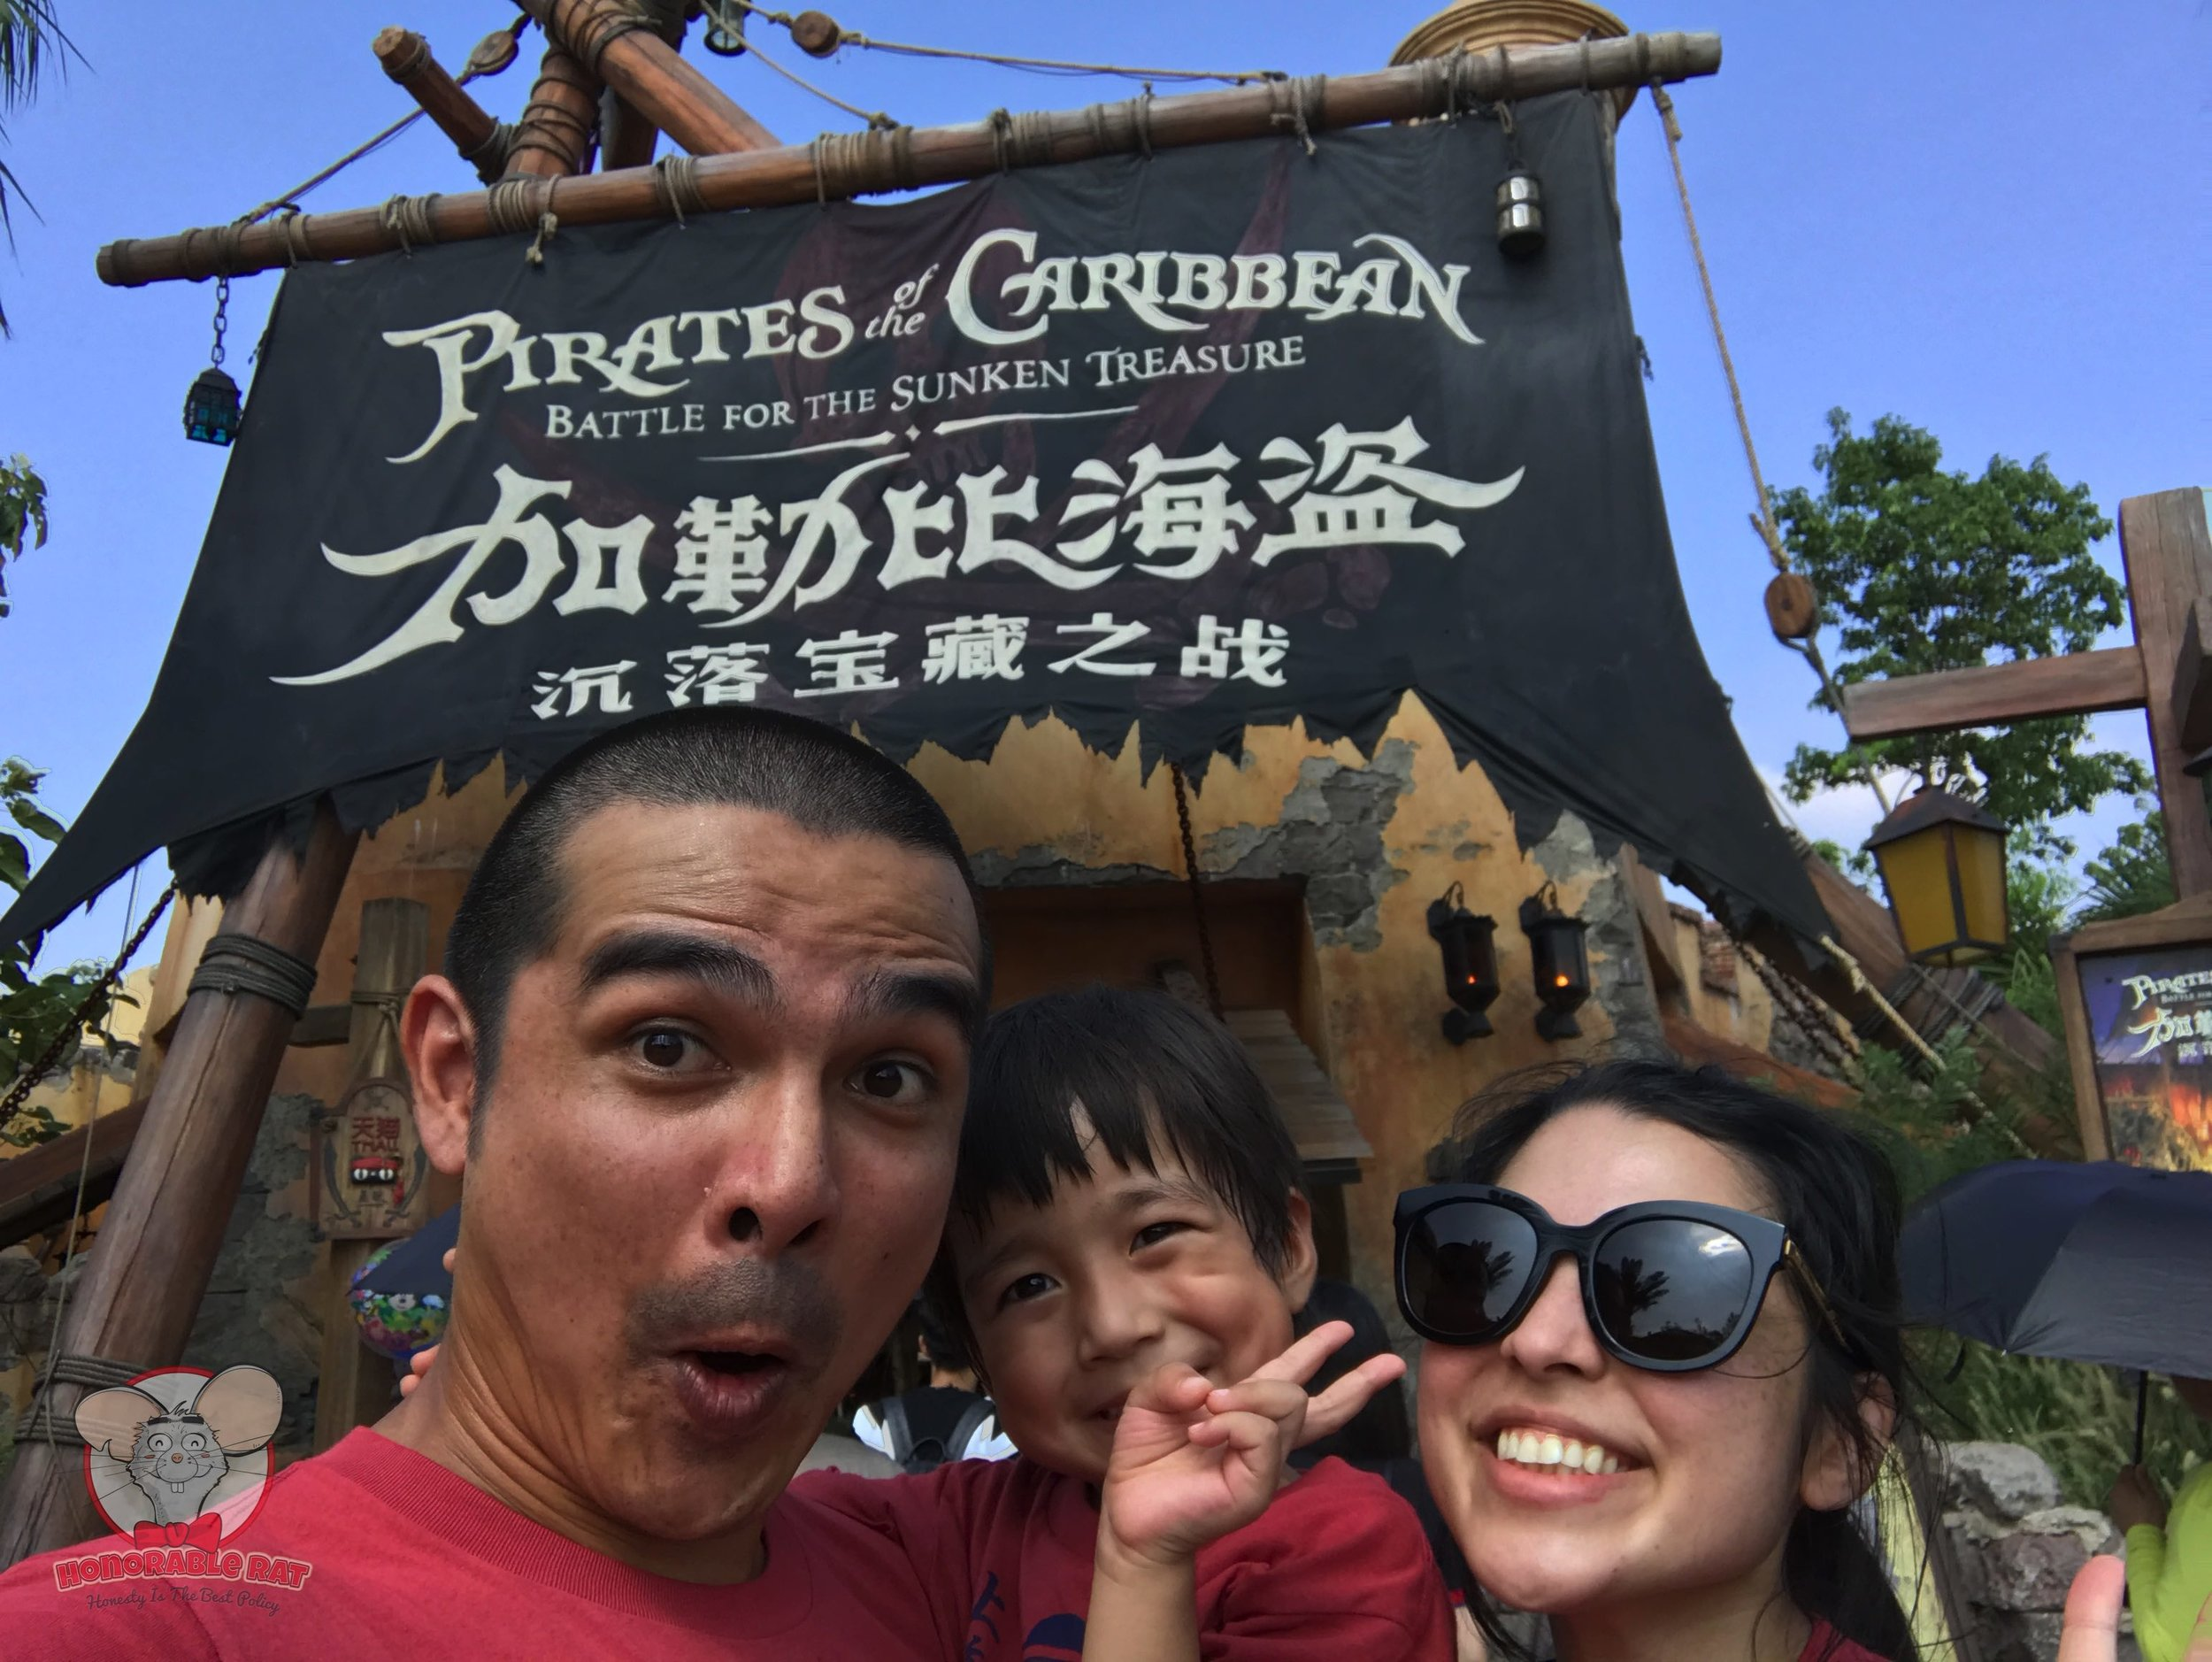 Pirates of the Caribbean again....